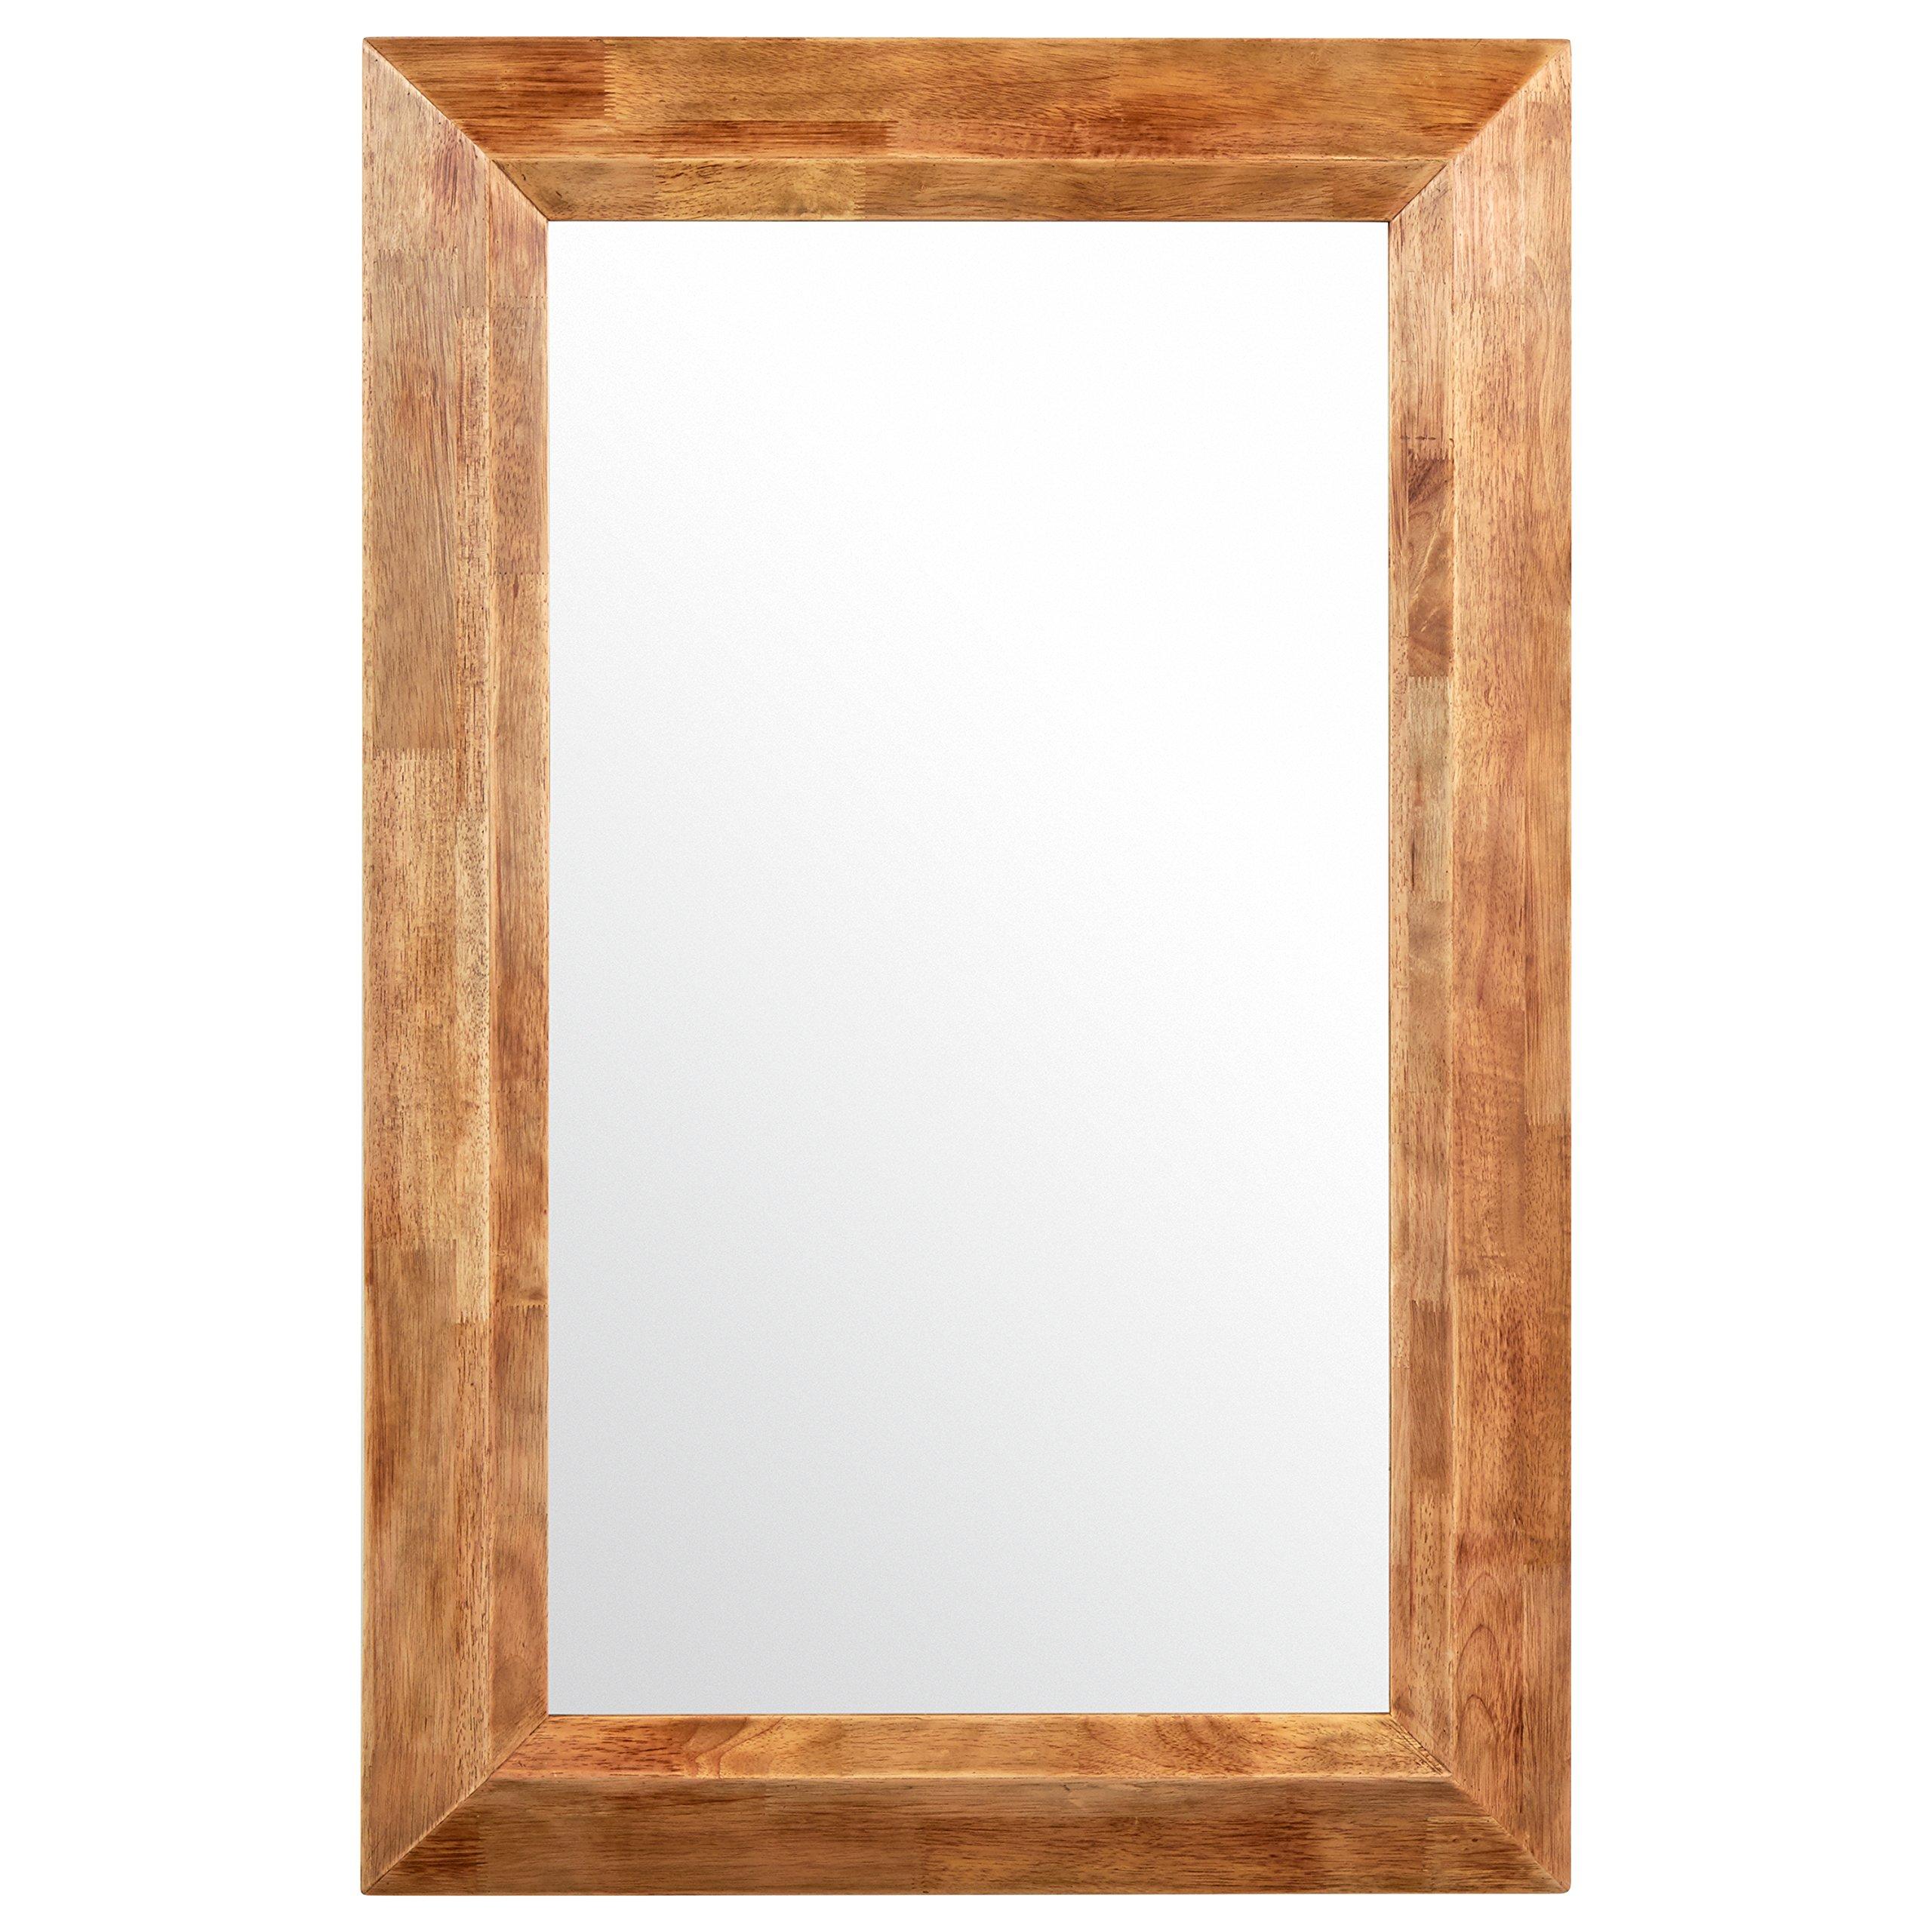 Stone & Beam Rustic Wood Frame Mirror, 39.75''H, Natural